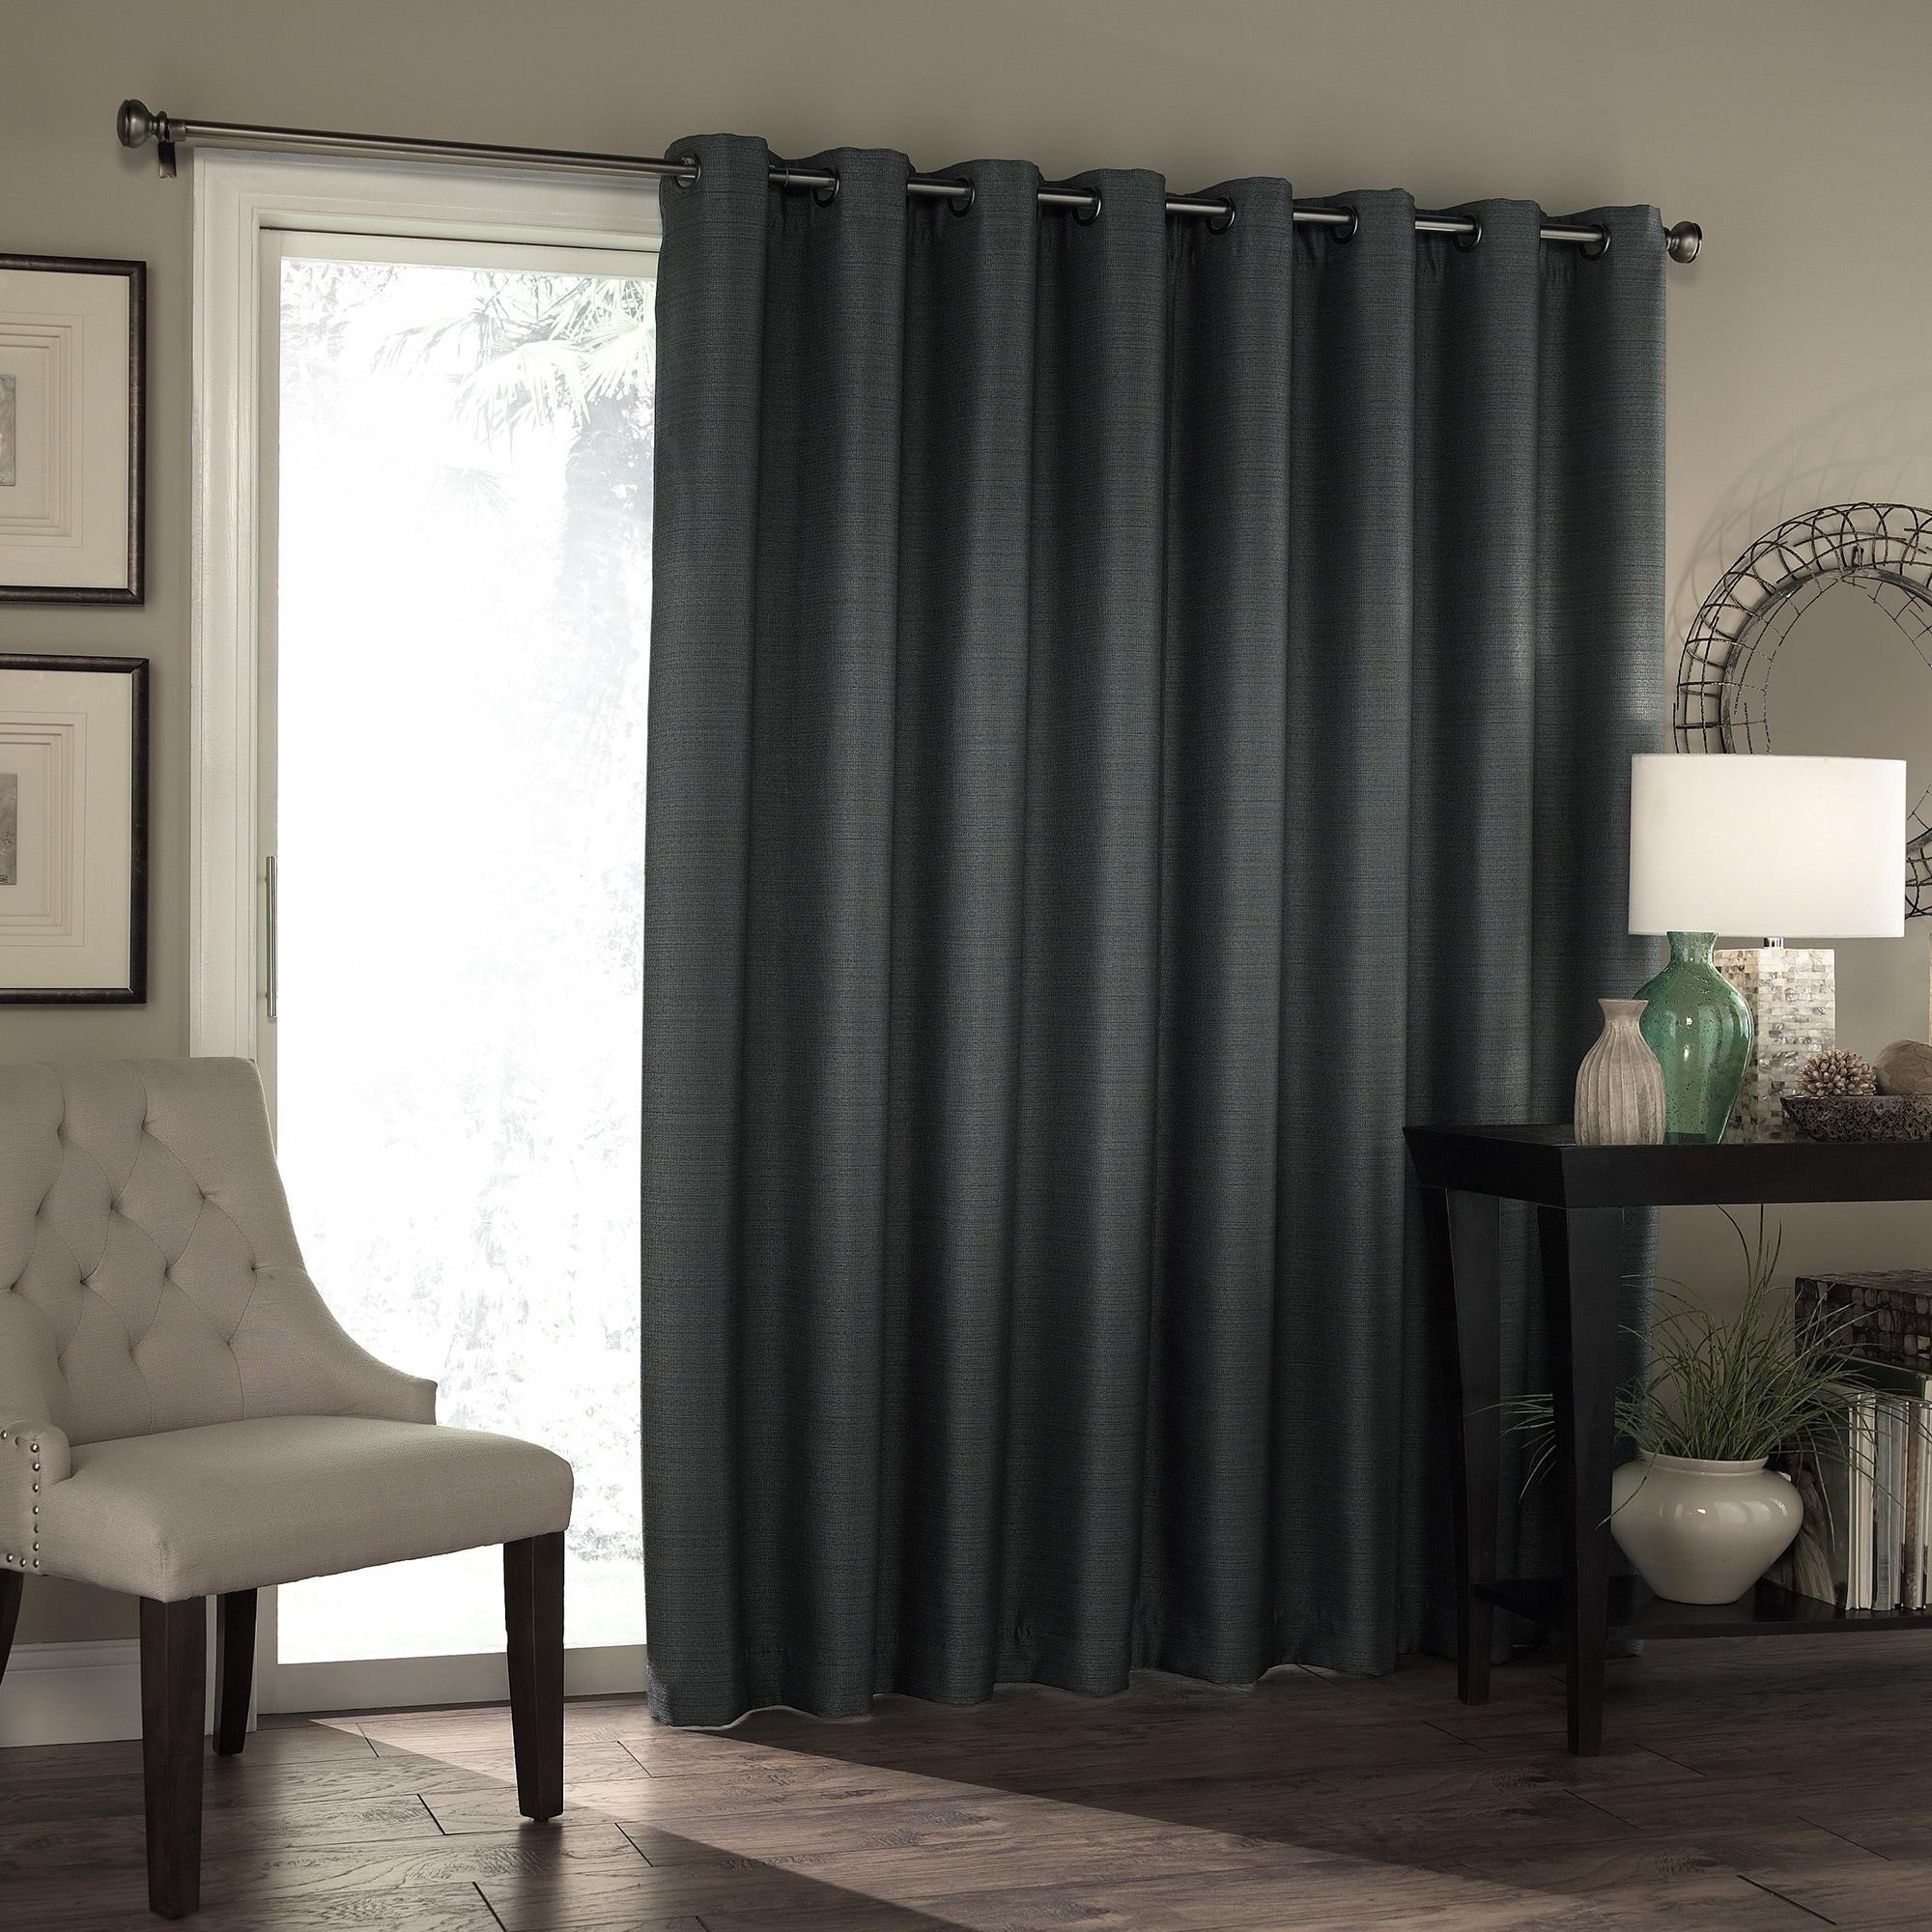 Top Blackout Patio Door Curtain Panel Zachary Kristen